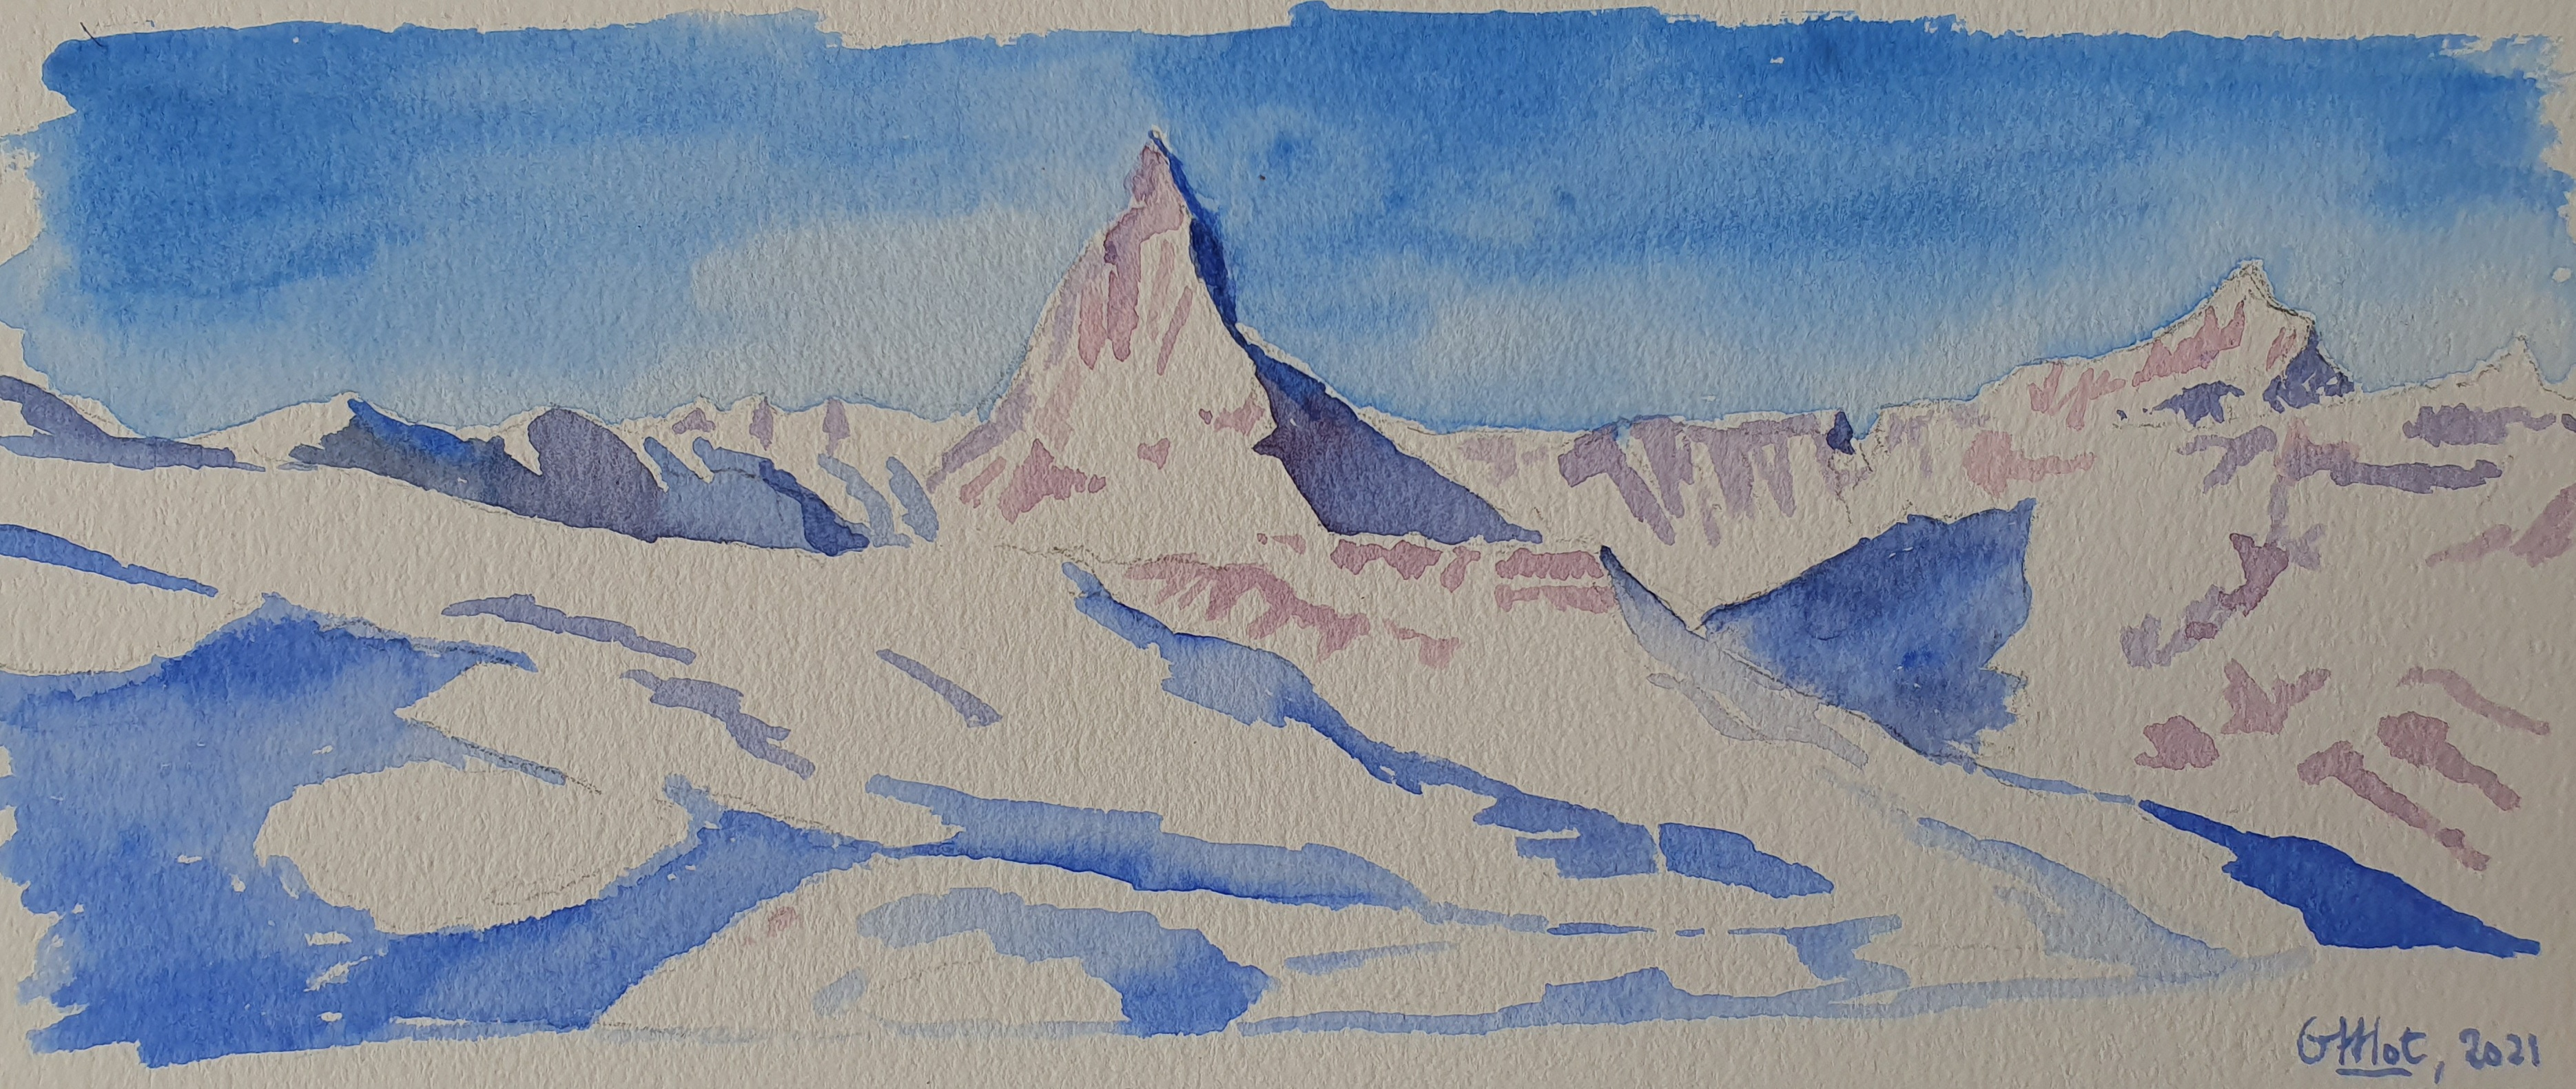 Aquarelle - Zermatt